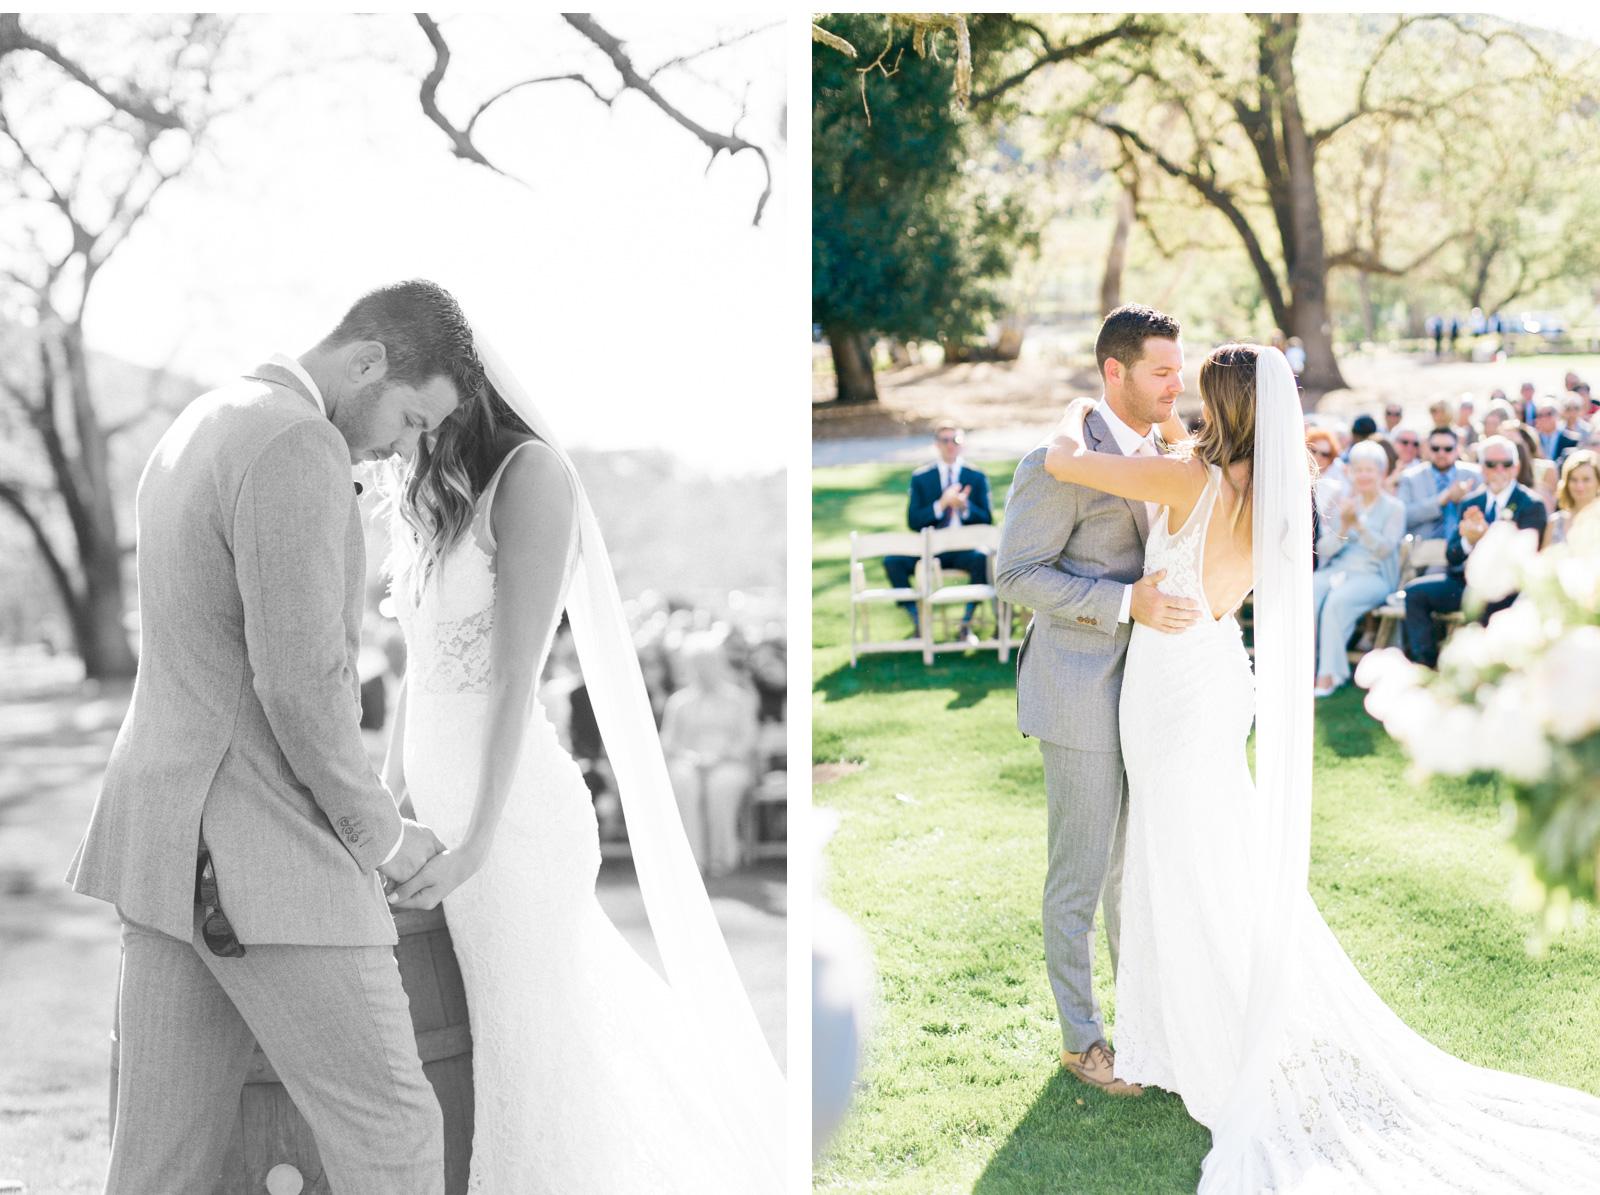 Malibu-Wedding-Photographer-Dani-Piercy-Inspired-by-This-Triunfo-Creek-Wedding-Natalie-Schutt-Photography_03.jpg